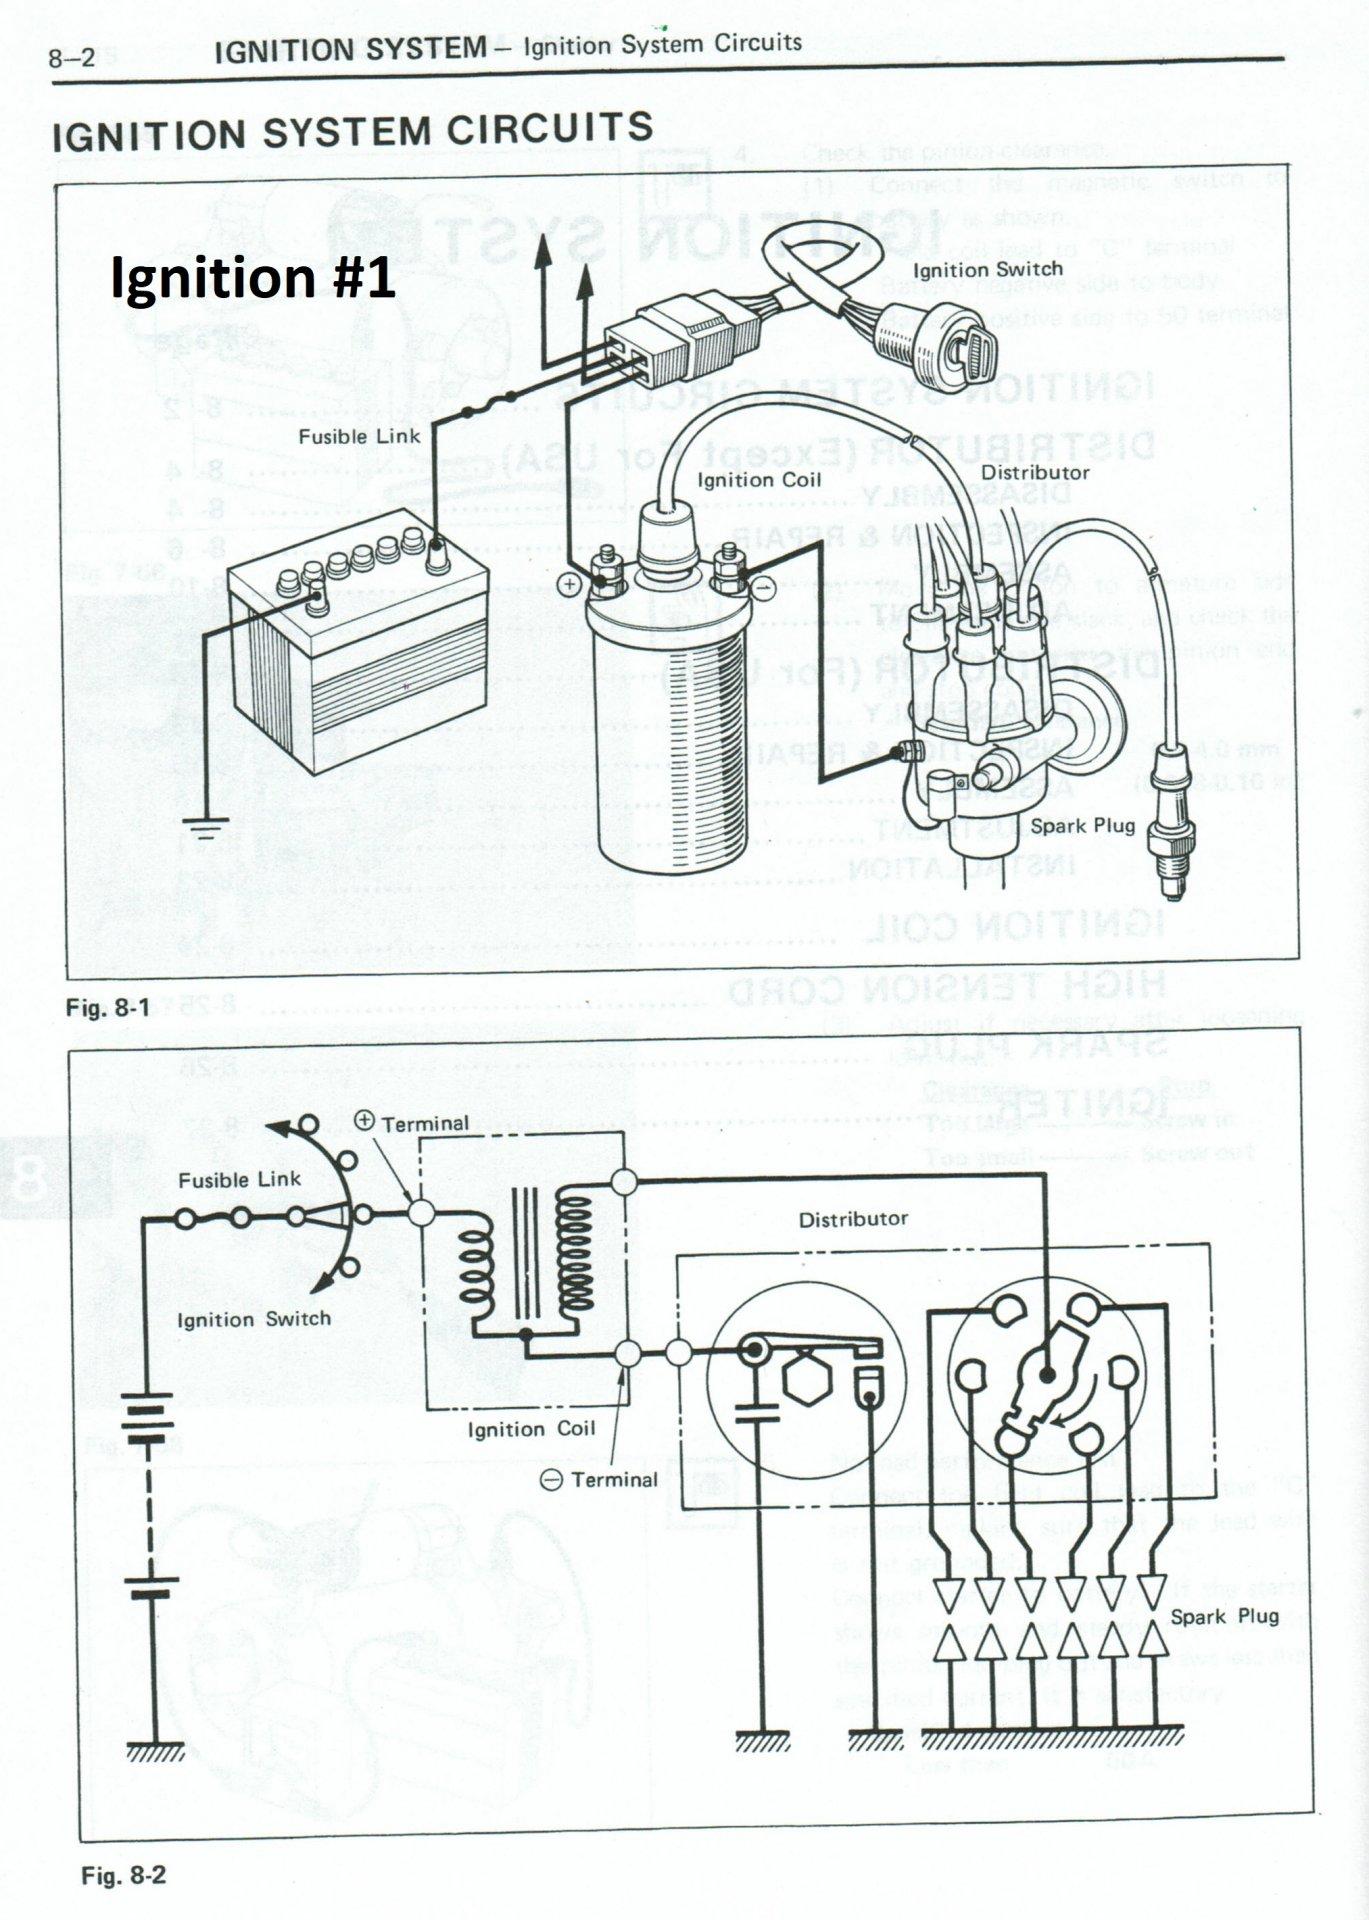 Ignition #1.jpg